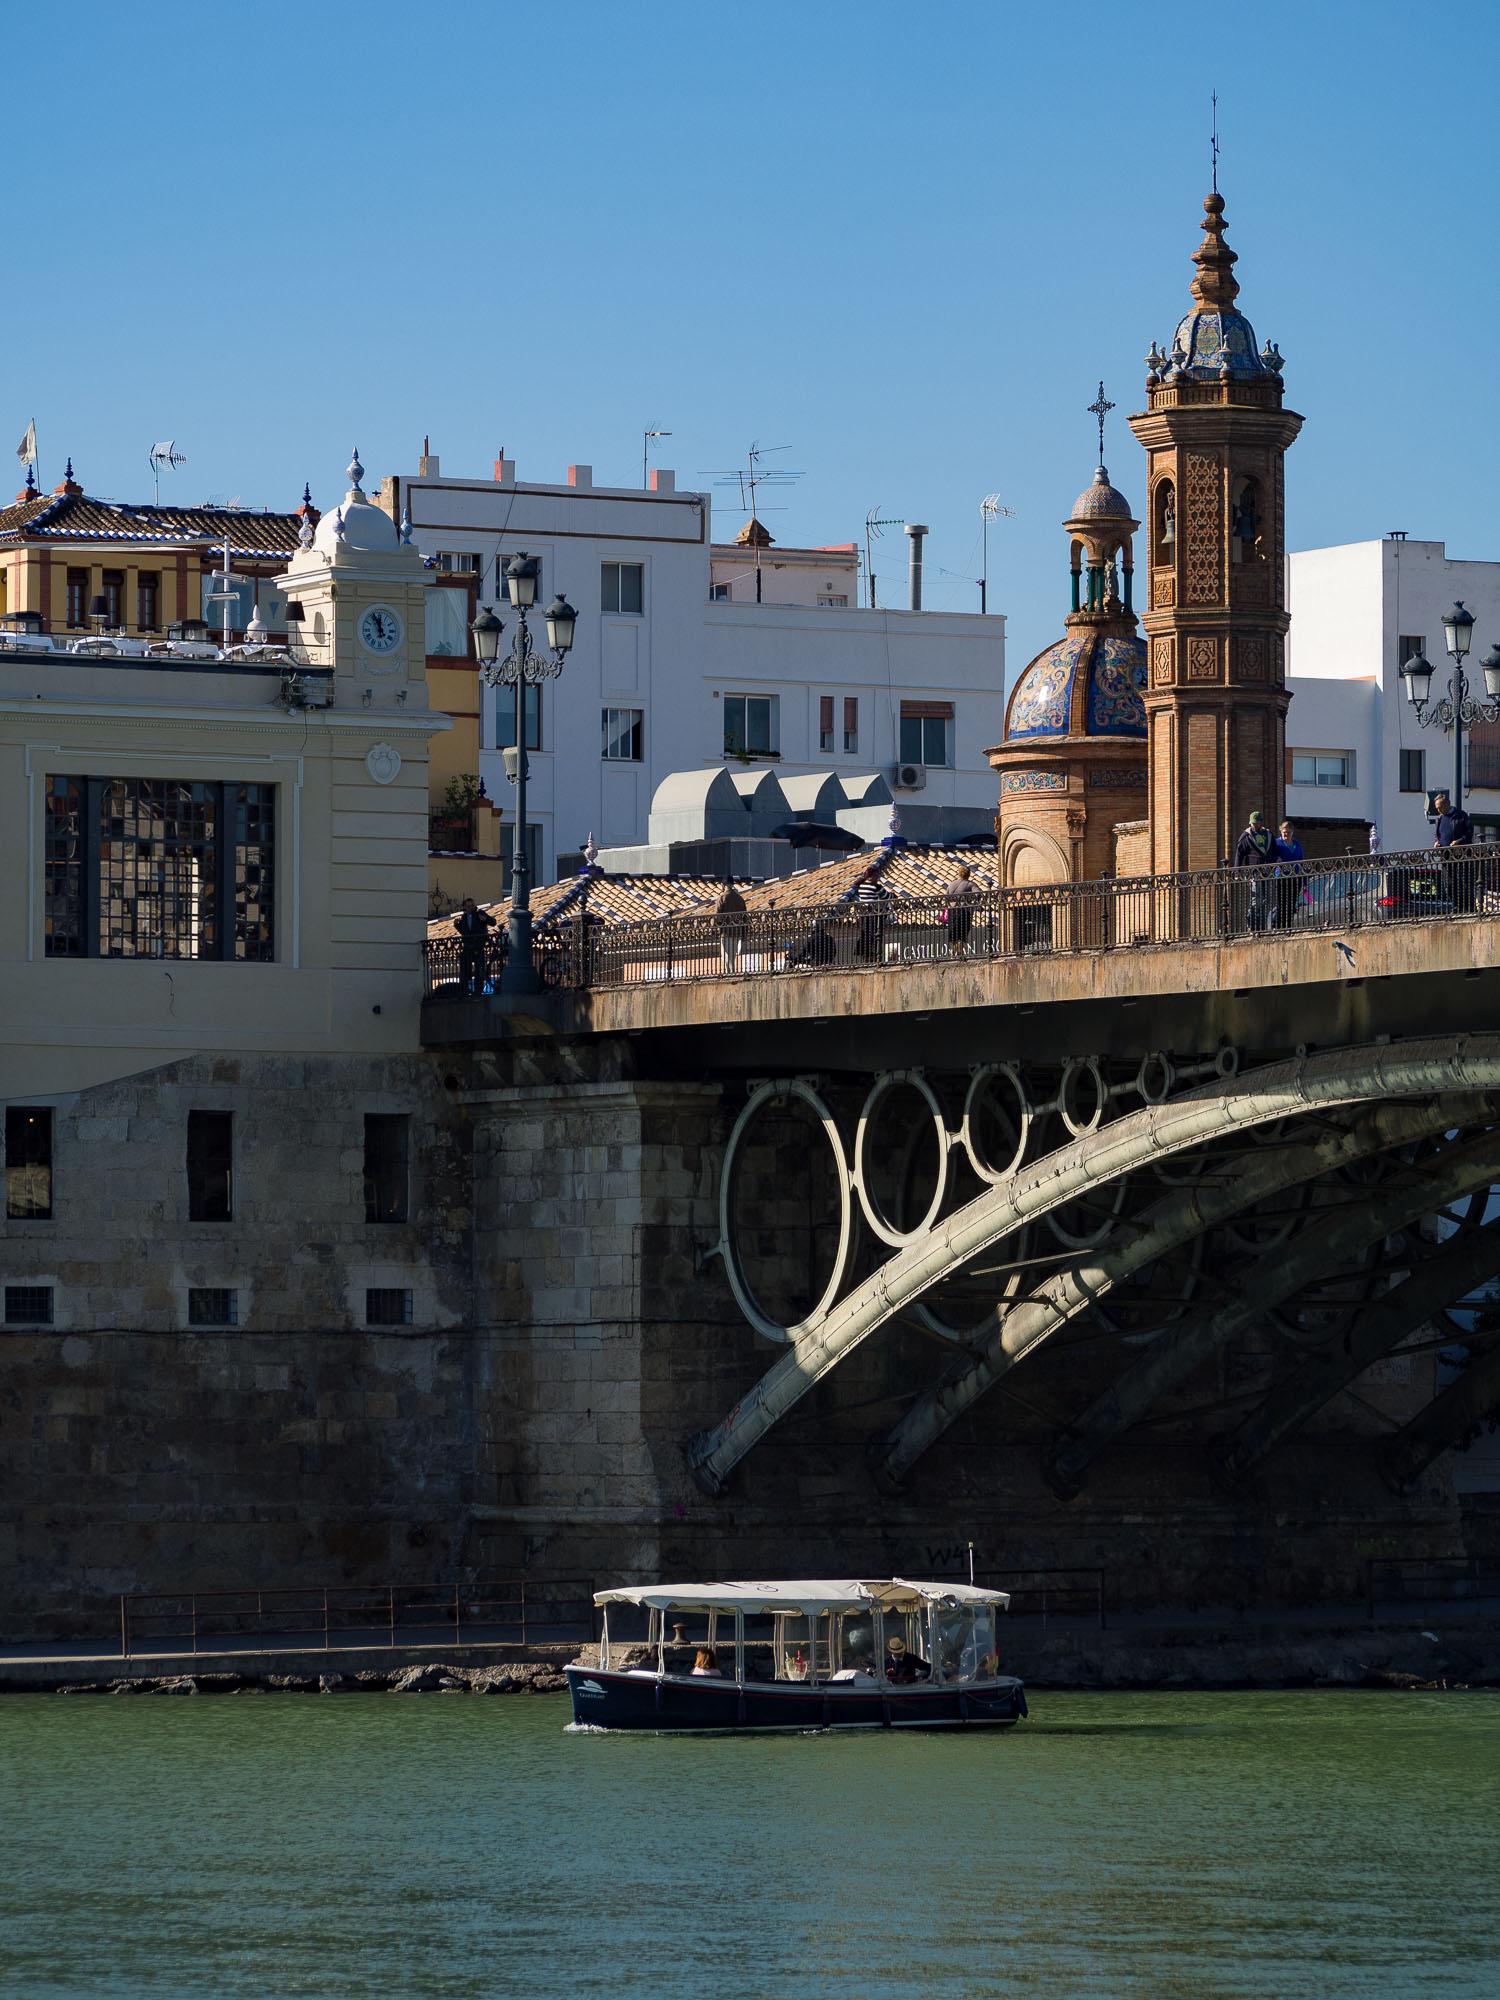 'Electric boat under Puente de Triana'  Oly E-M10 mkII + 40-150mm f/4-5.6R @ 78mm, ISO 200, 1/800, f/5.6